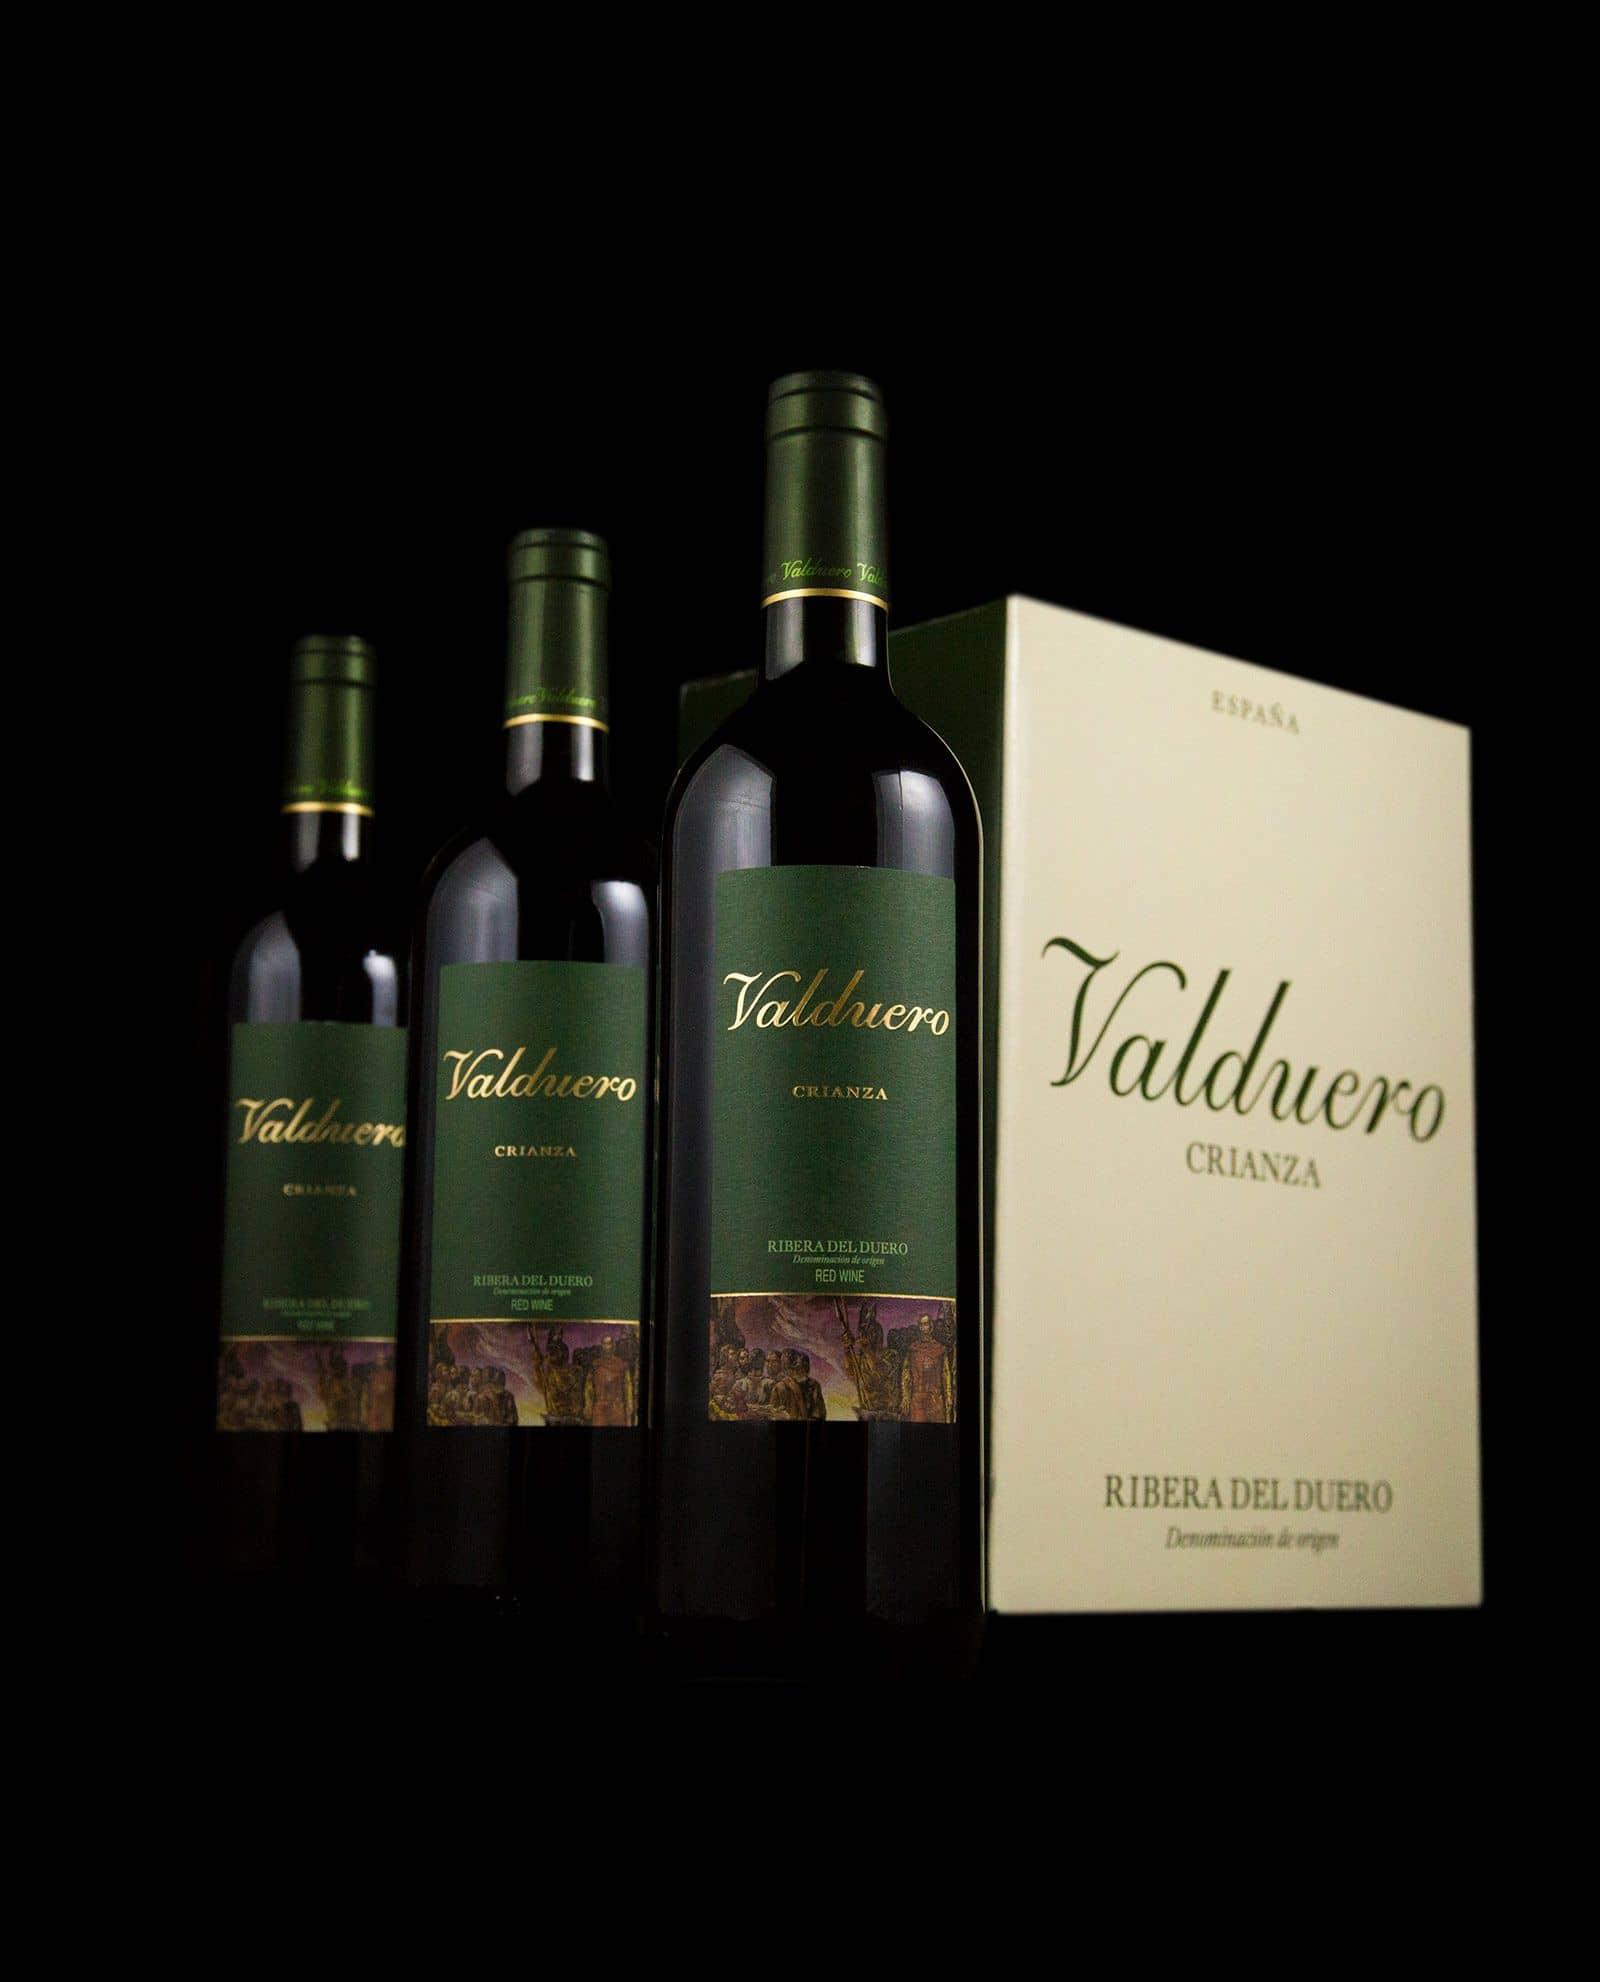 Caja grande Valduero crianza, caja de vino tinto de Ribera del Duero